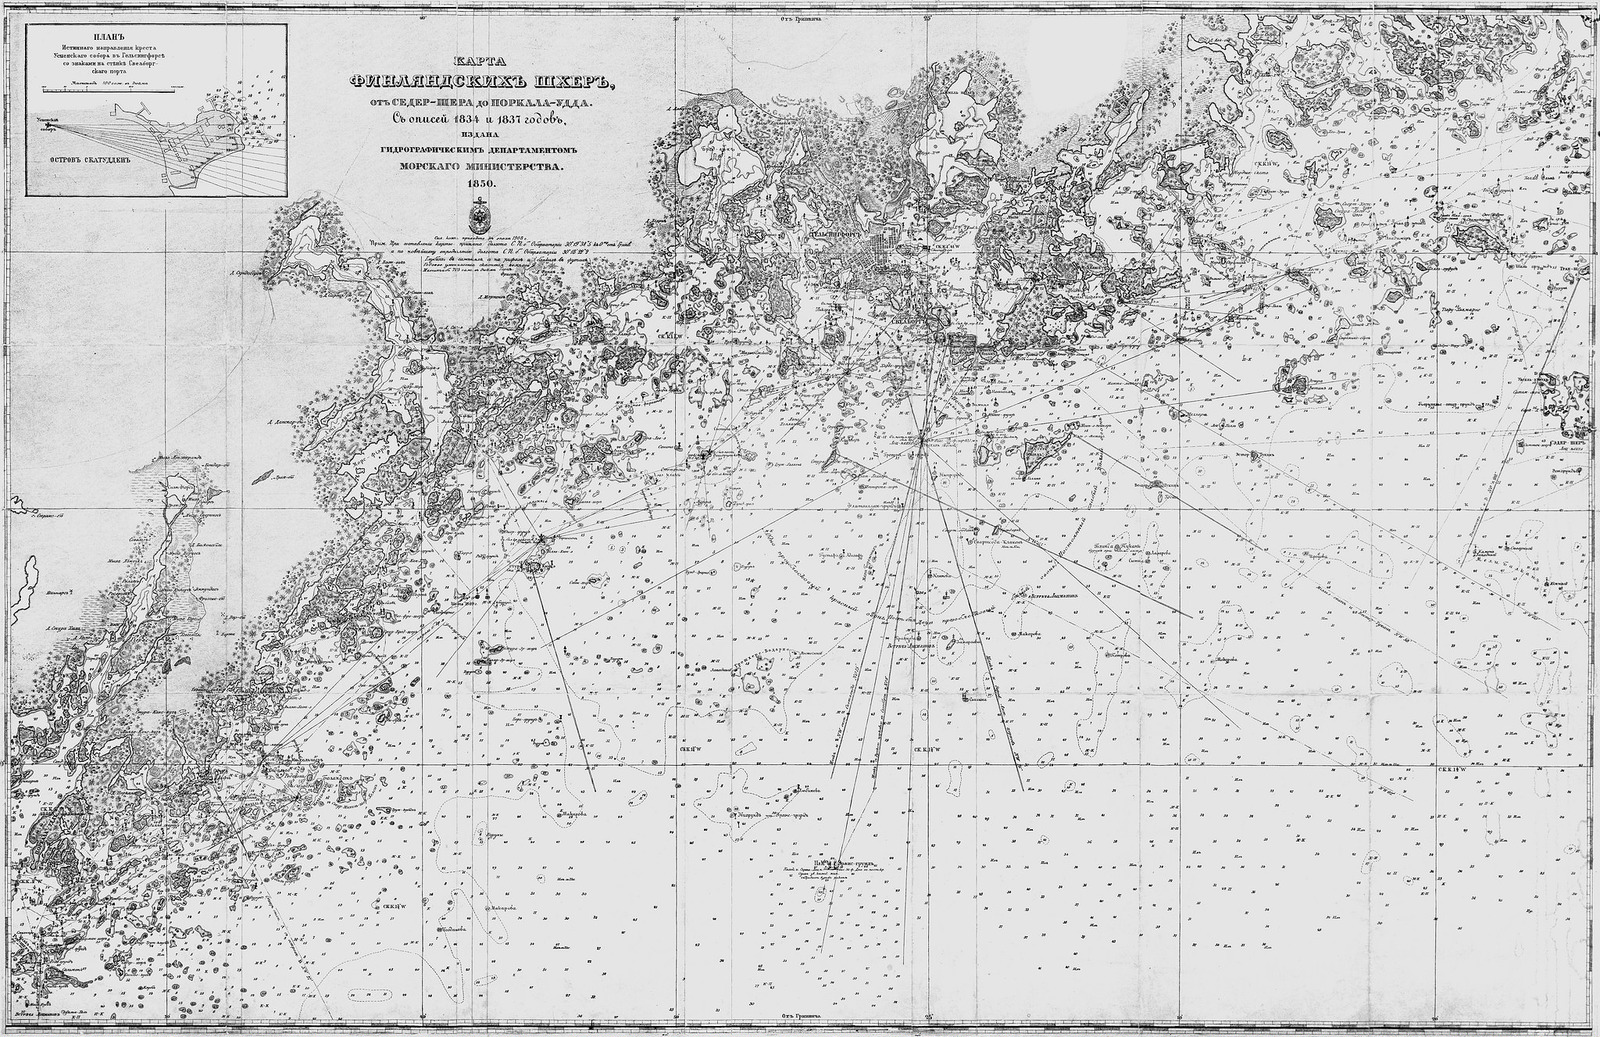 1850. Карта Финляндских шхер от Седен-Шера до Поркала-Удда